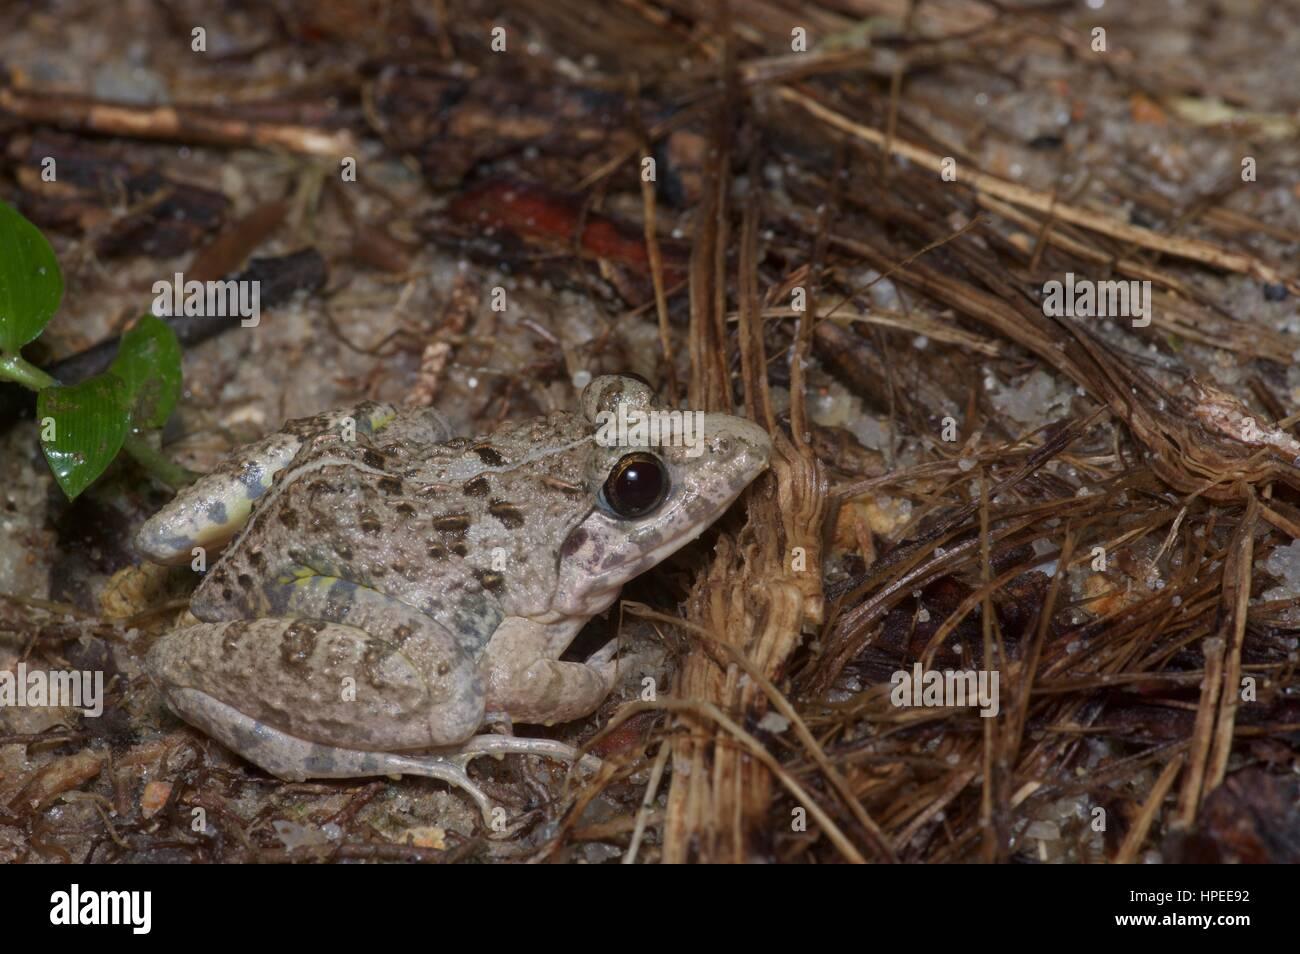 An Asian Grass Frog (Fejervarya limnocharis) in the rainforest at night in Ulu Semenyih, Selangor, Malaysia Stock Photo